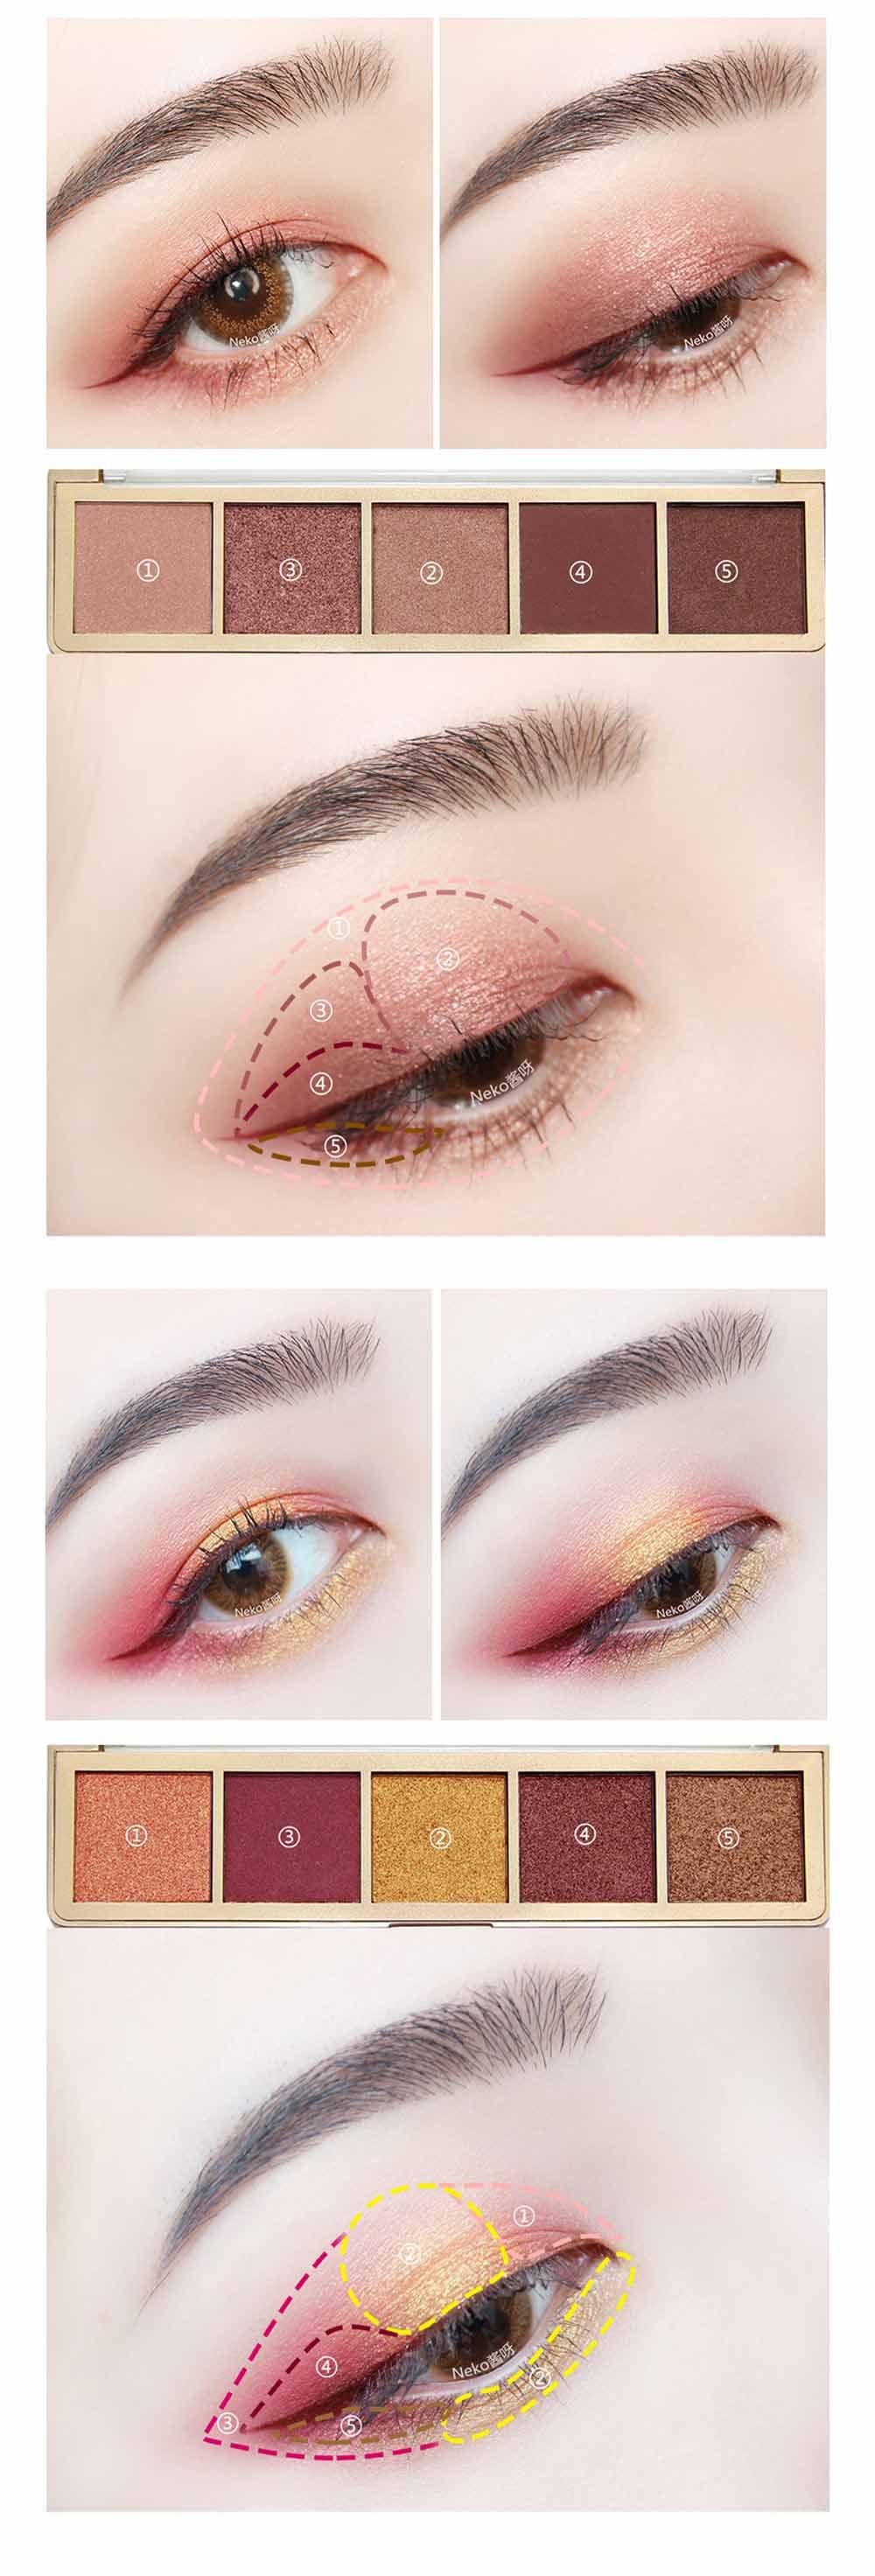 Compact Eyeshadow Palette Matte Waterproof 5 Colors Eye Makeup Natural Smoky Eye Shadow Cosmetic 7